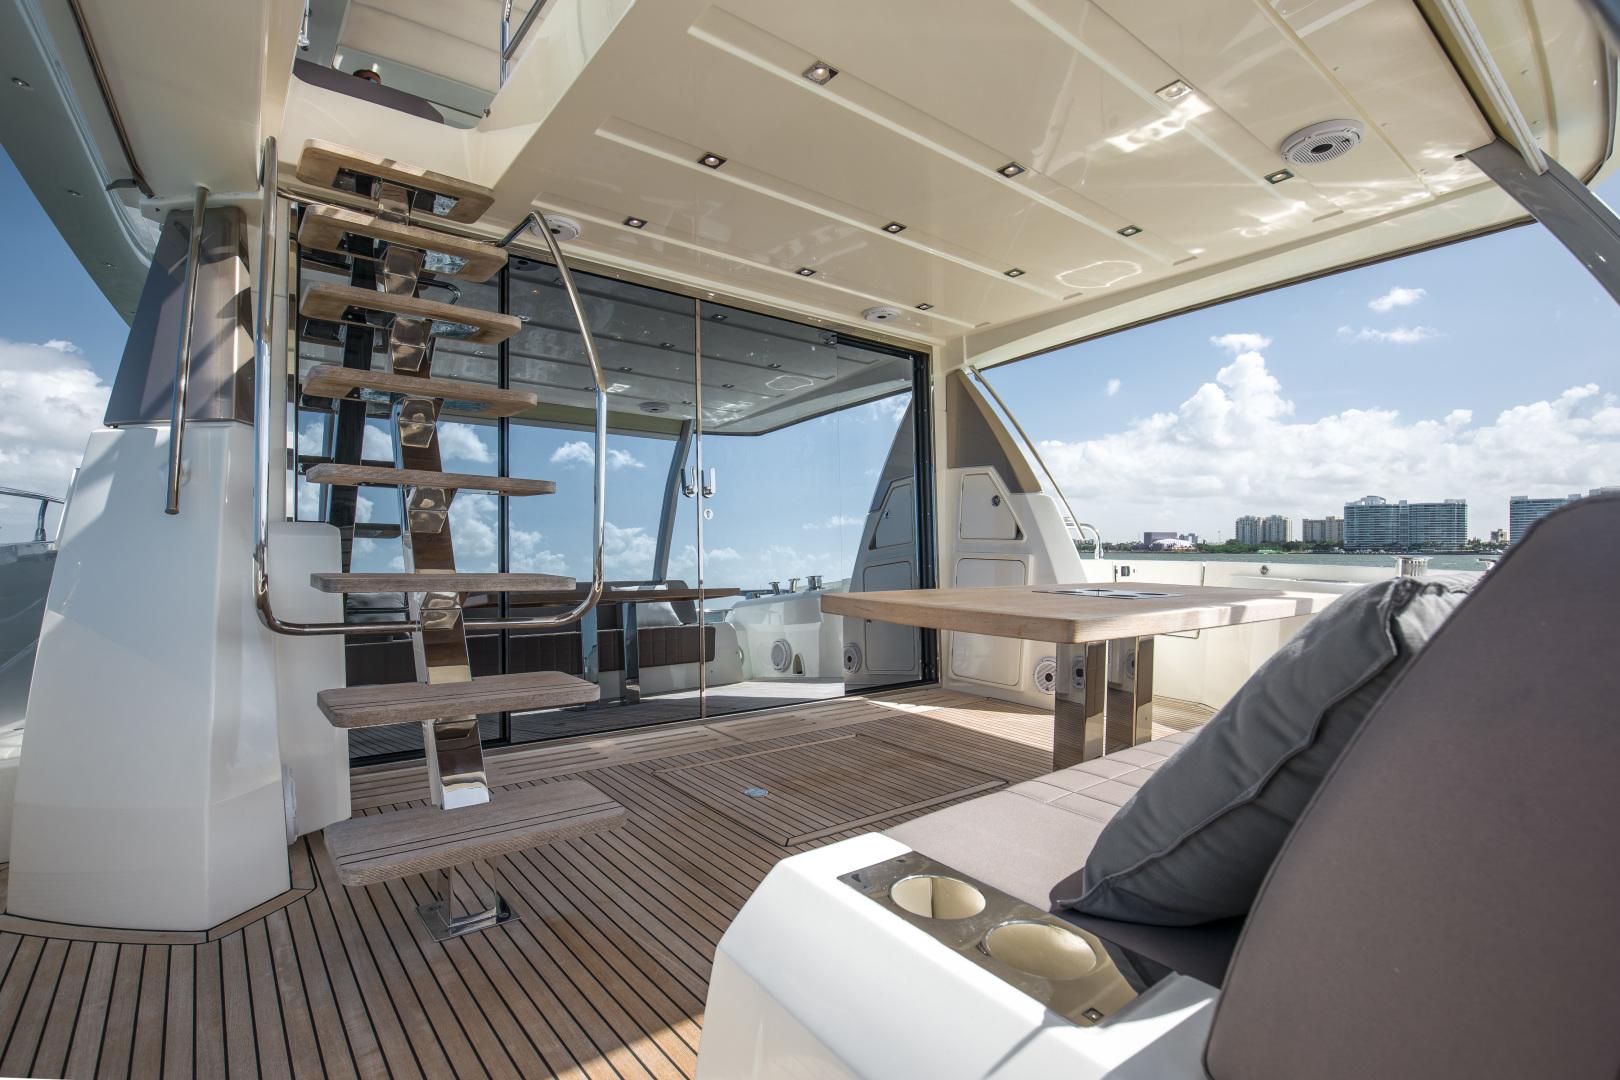 Prestige-680 Flybridge 2018-Seduction Sarasota-Florida-United States-2018 68 Prestige 680 Flybridge  Cockpit Aft Deck-1498991 | Thumbnail